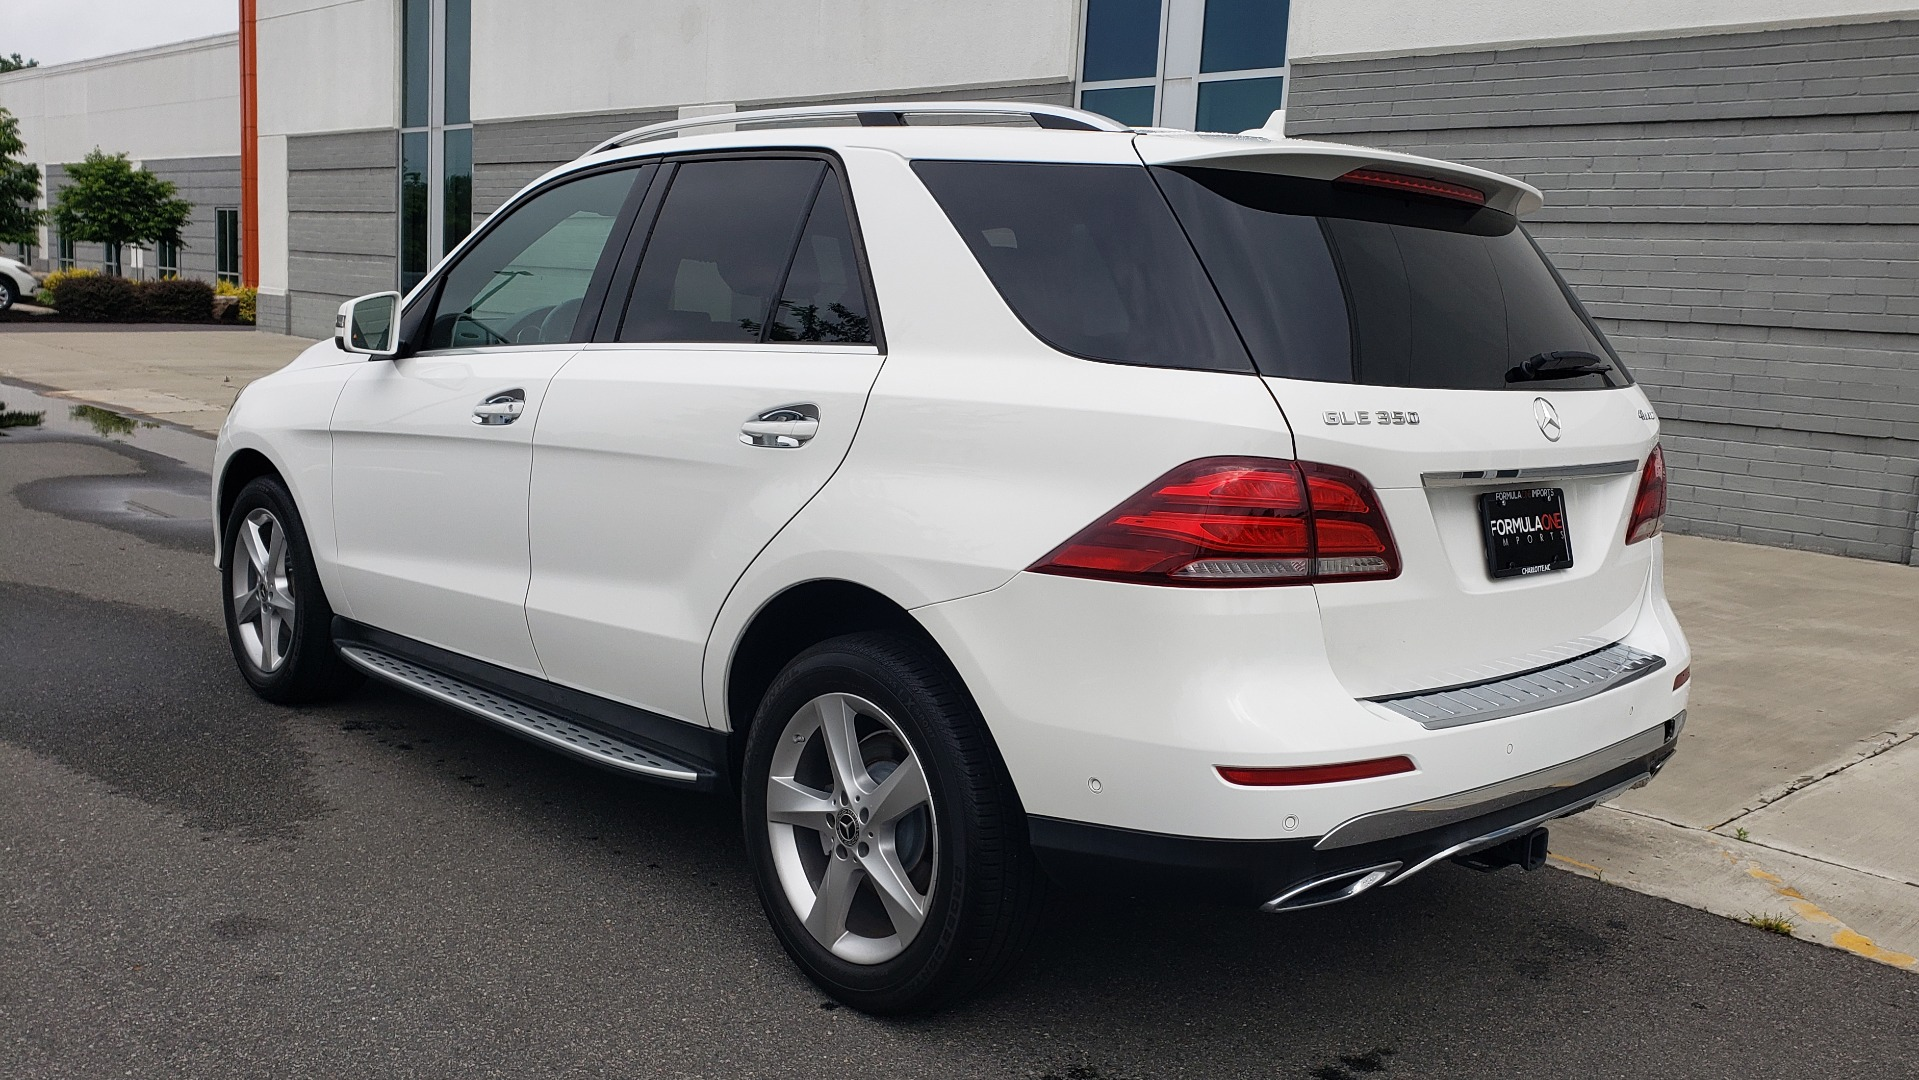 Used 2018 Mercedes-Benz GLE 350 4MATIC / PREM PKG / NAV / PARK ASST / K/H SND / HITCH / REARVIEW for sale $40,801 at Formula Imports in Charlotte NC 28227 6